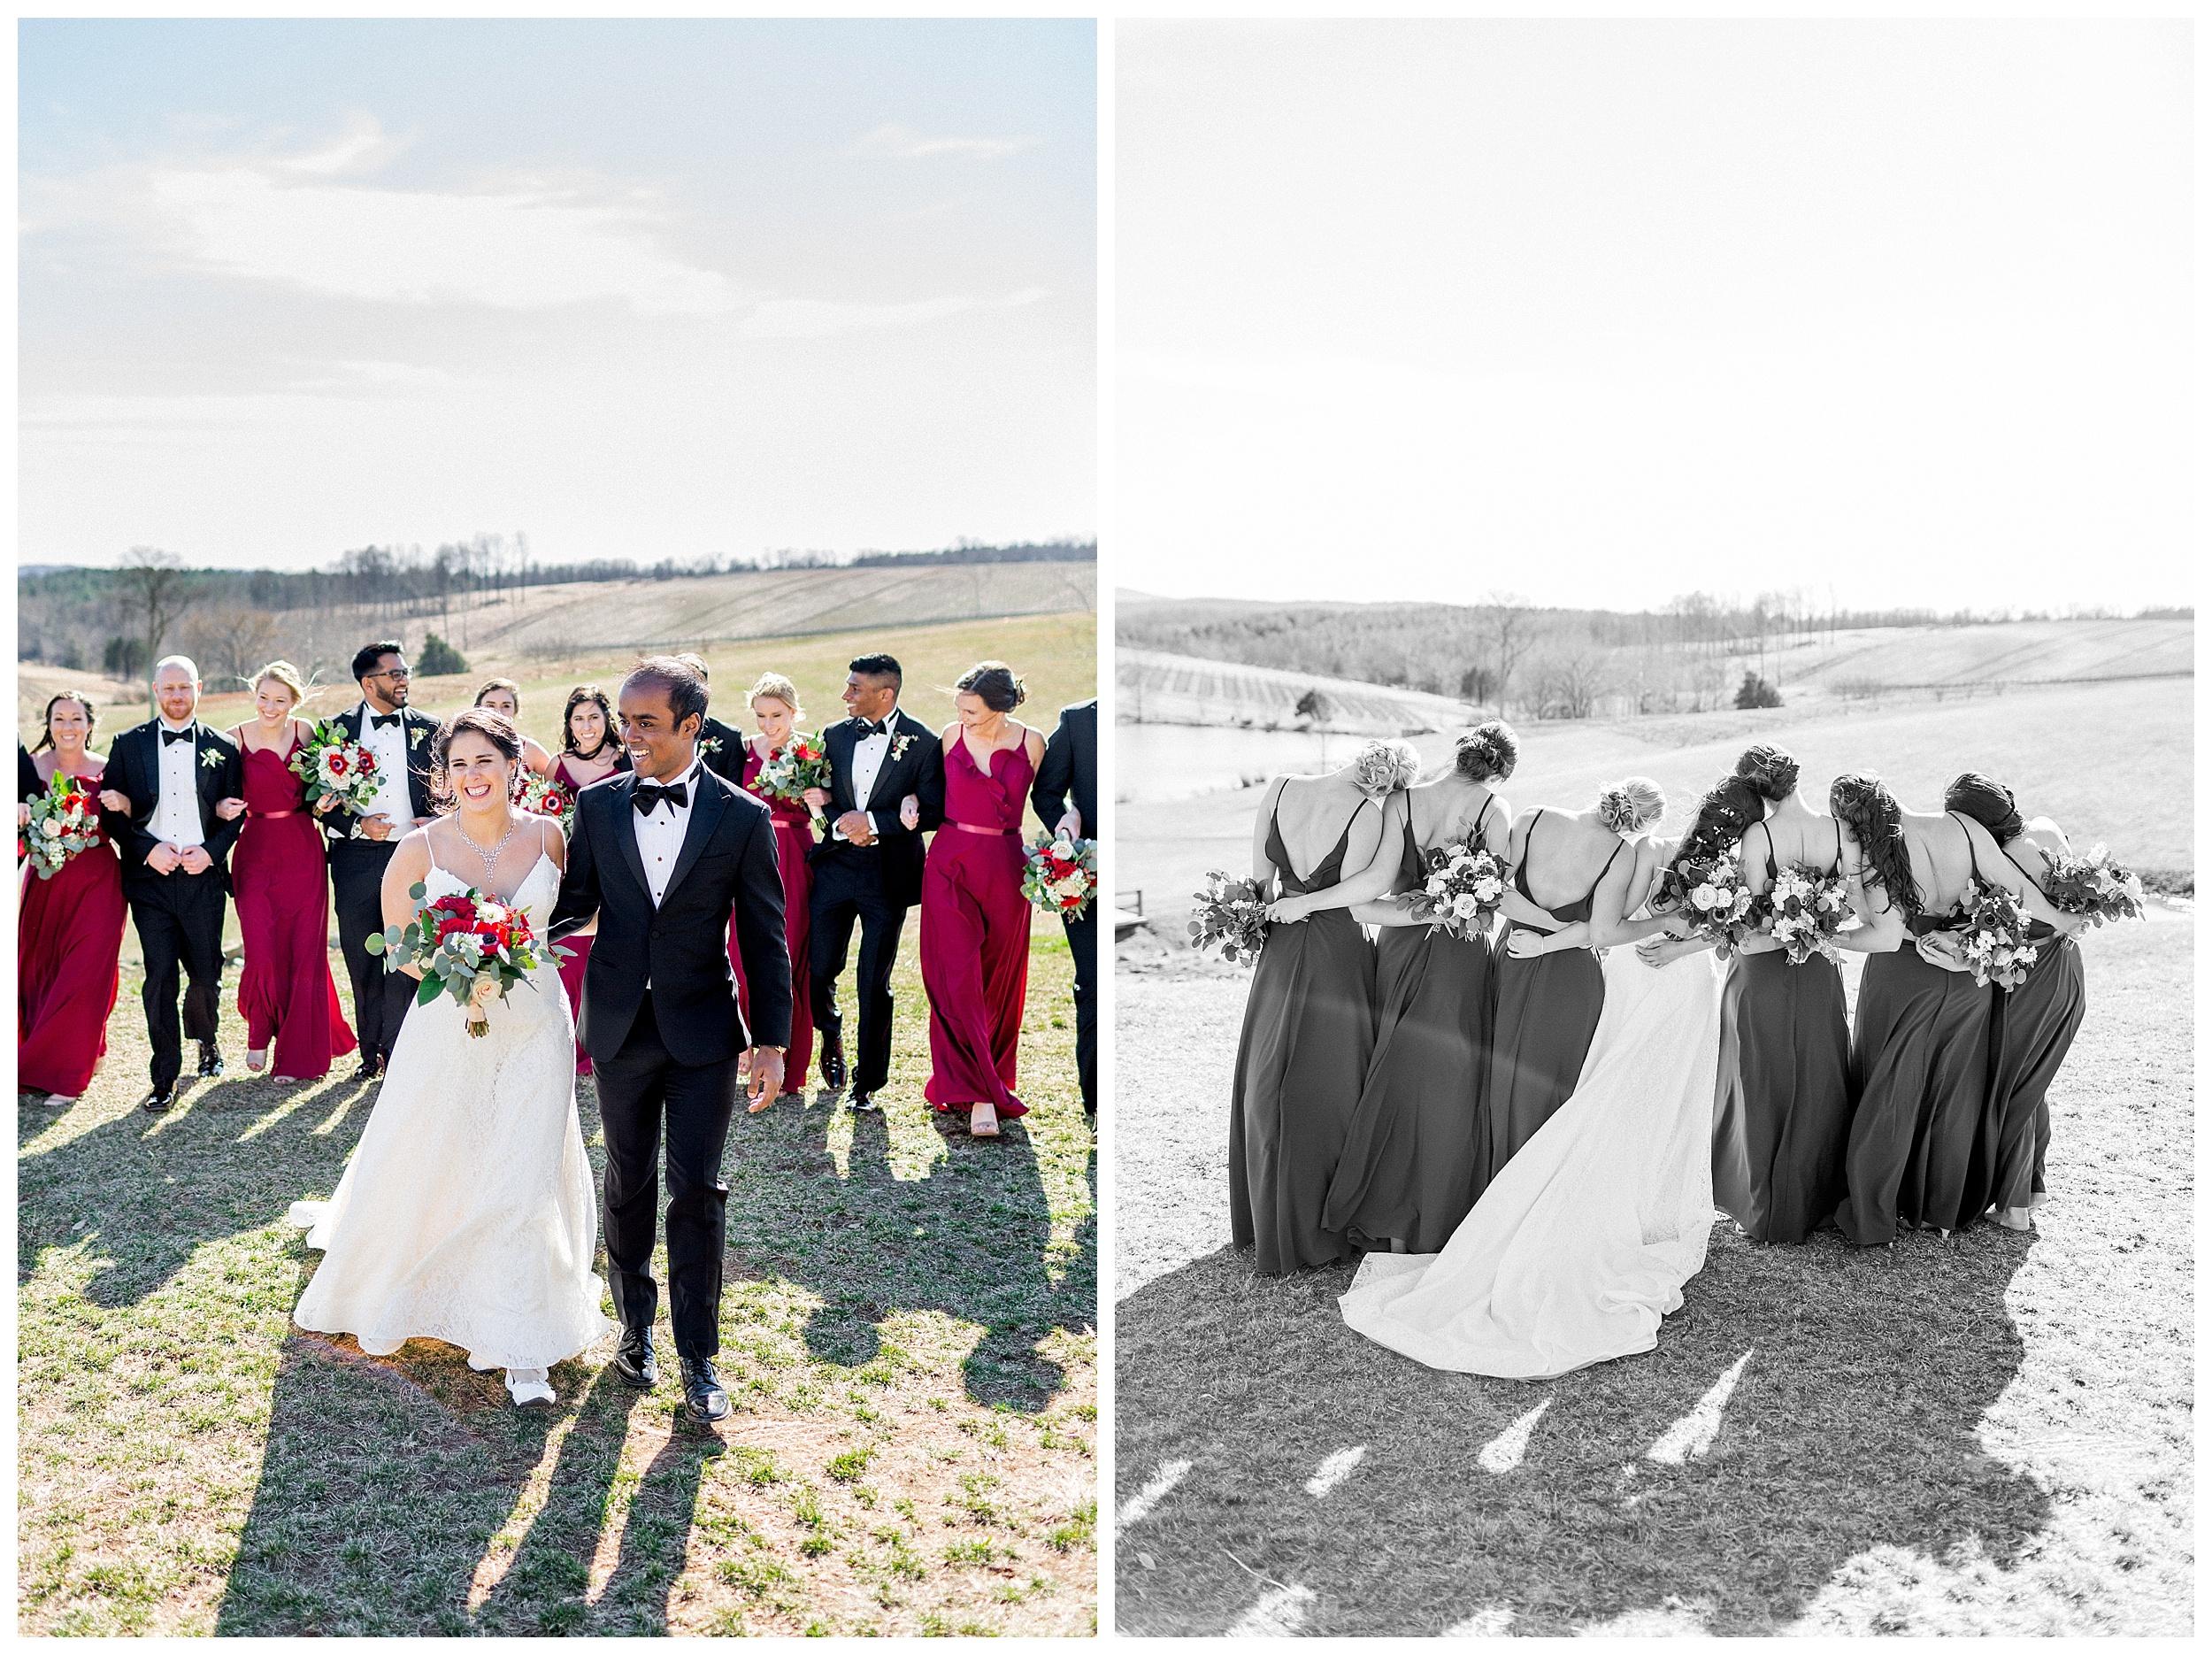 Stone Tower Winery Wedding | Virginia Winter Wedding | VA Wedding Photographer Kir Tuben_0077.jpg